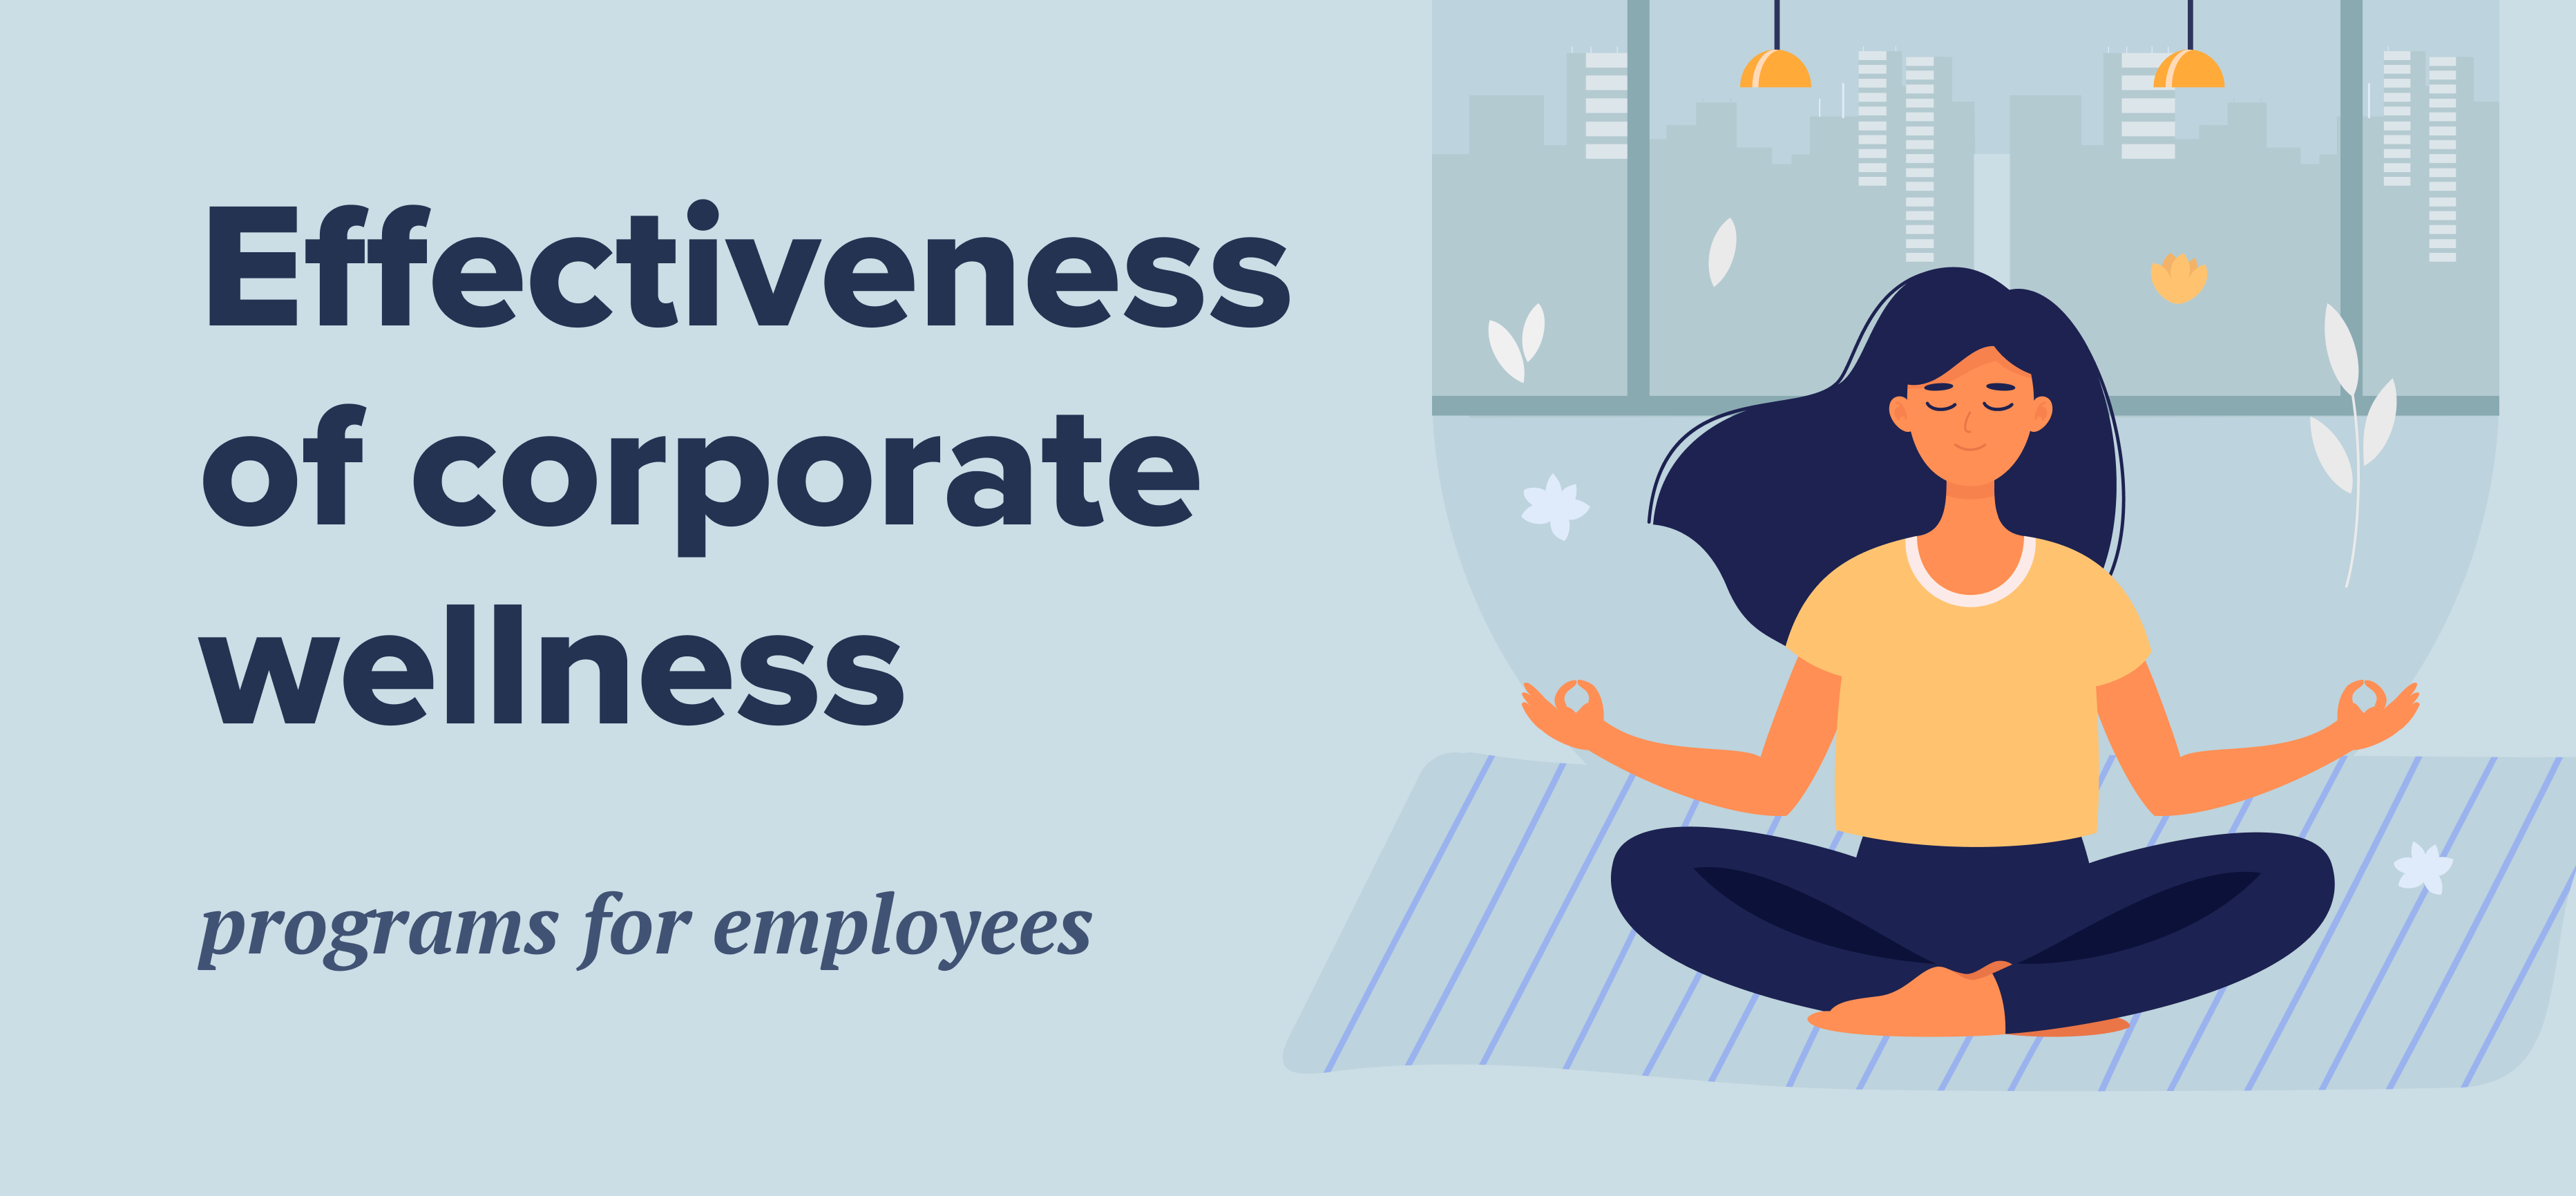 Effectiveness of corporate wellness programs